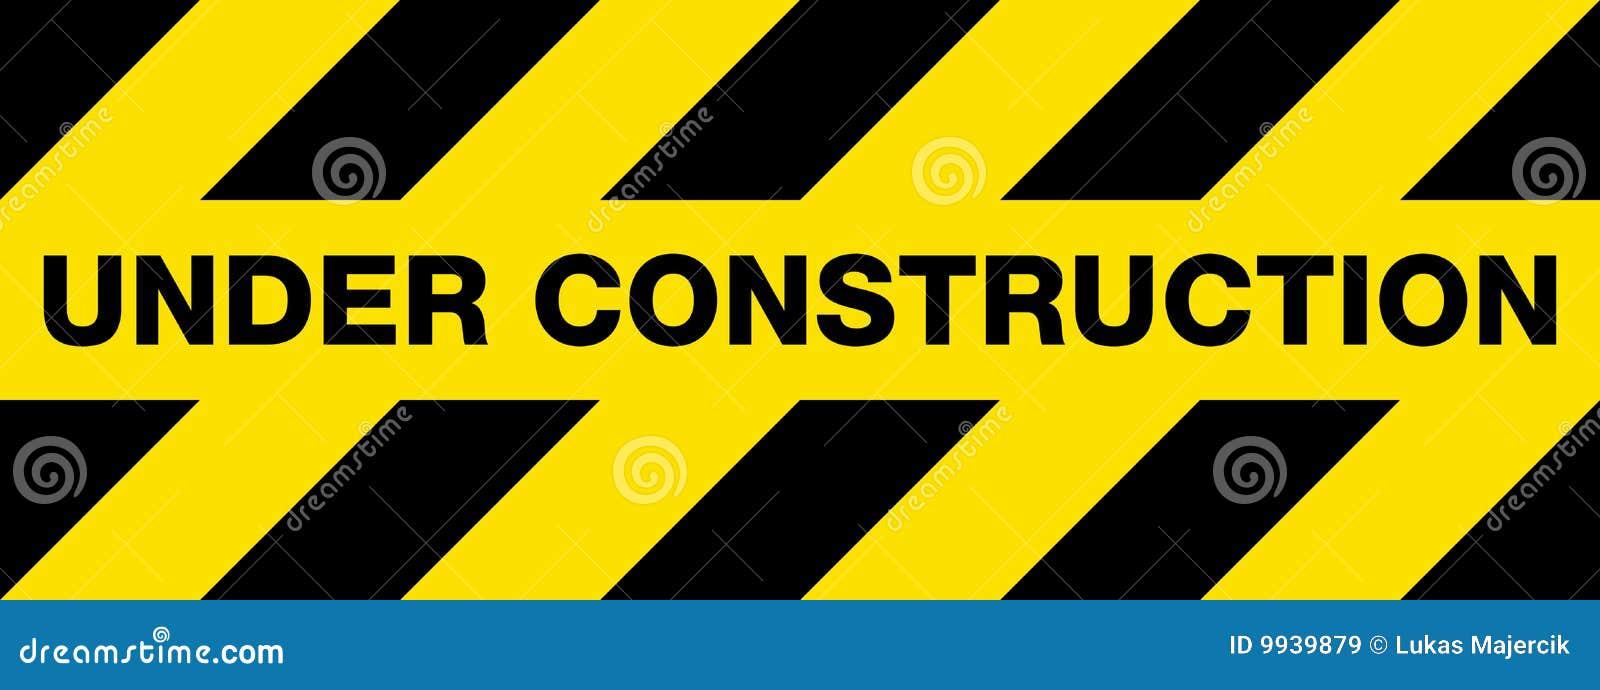 Under construction sign Under Construction Signs